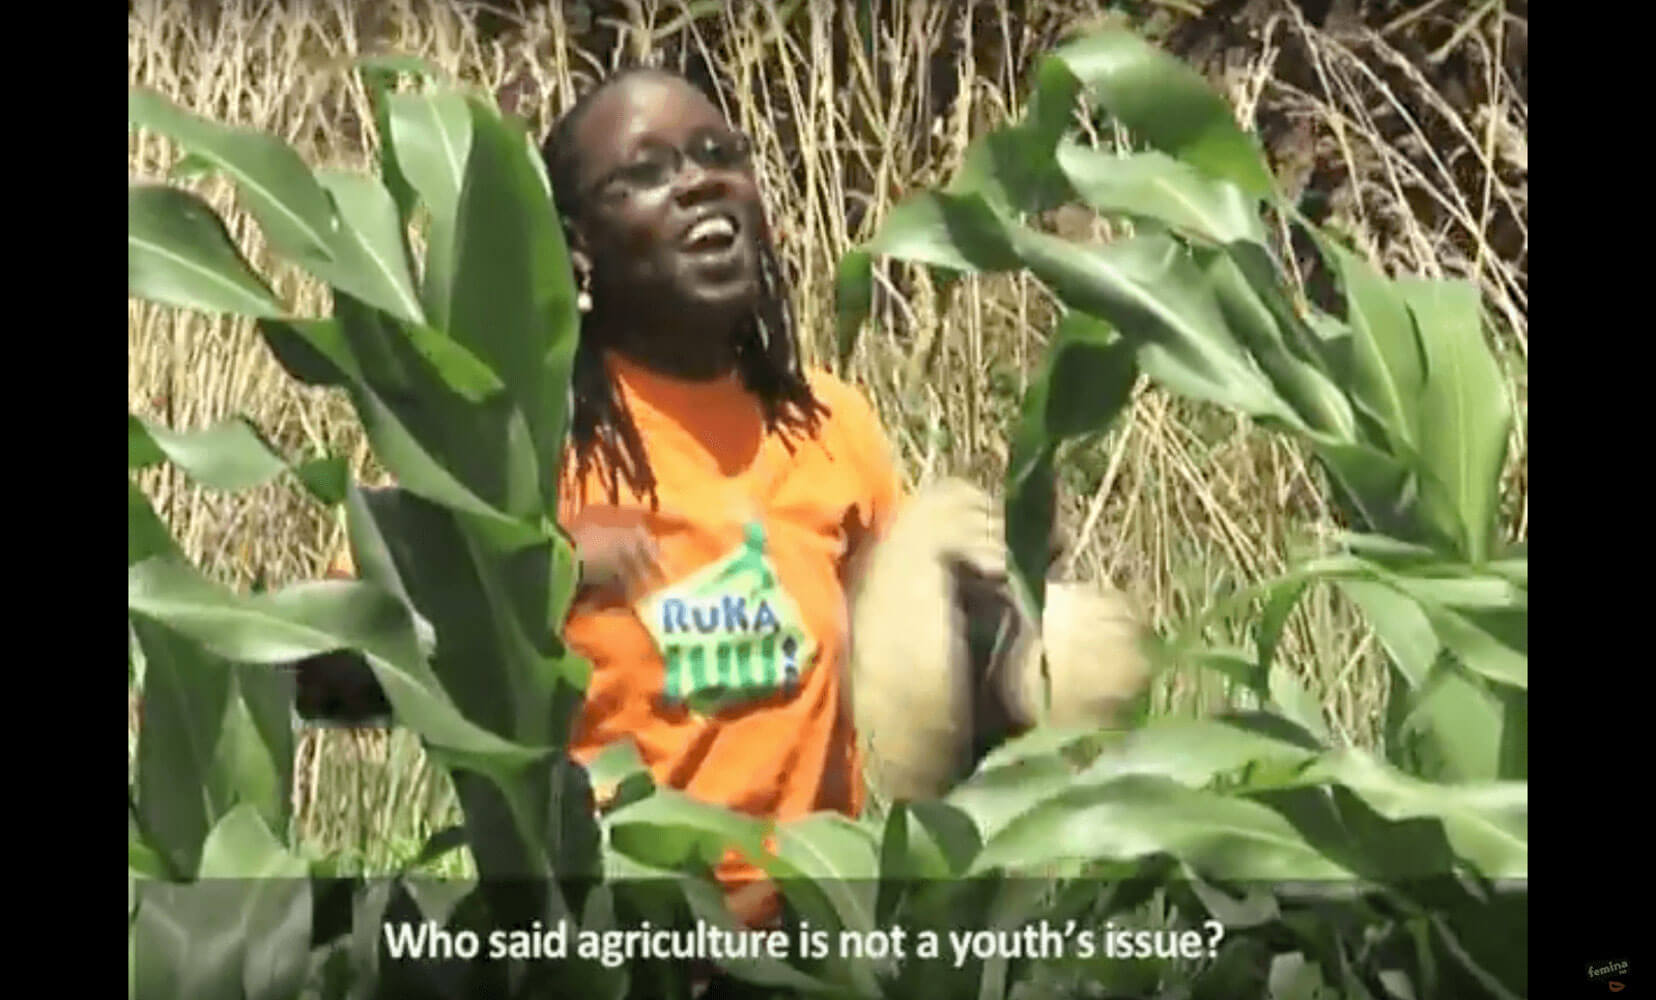 edutainment, Ruka Juu, communication for development, C4D, agriculture, entrepreneurship, youth